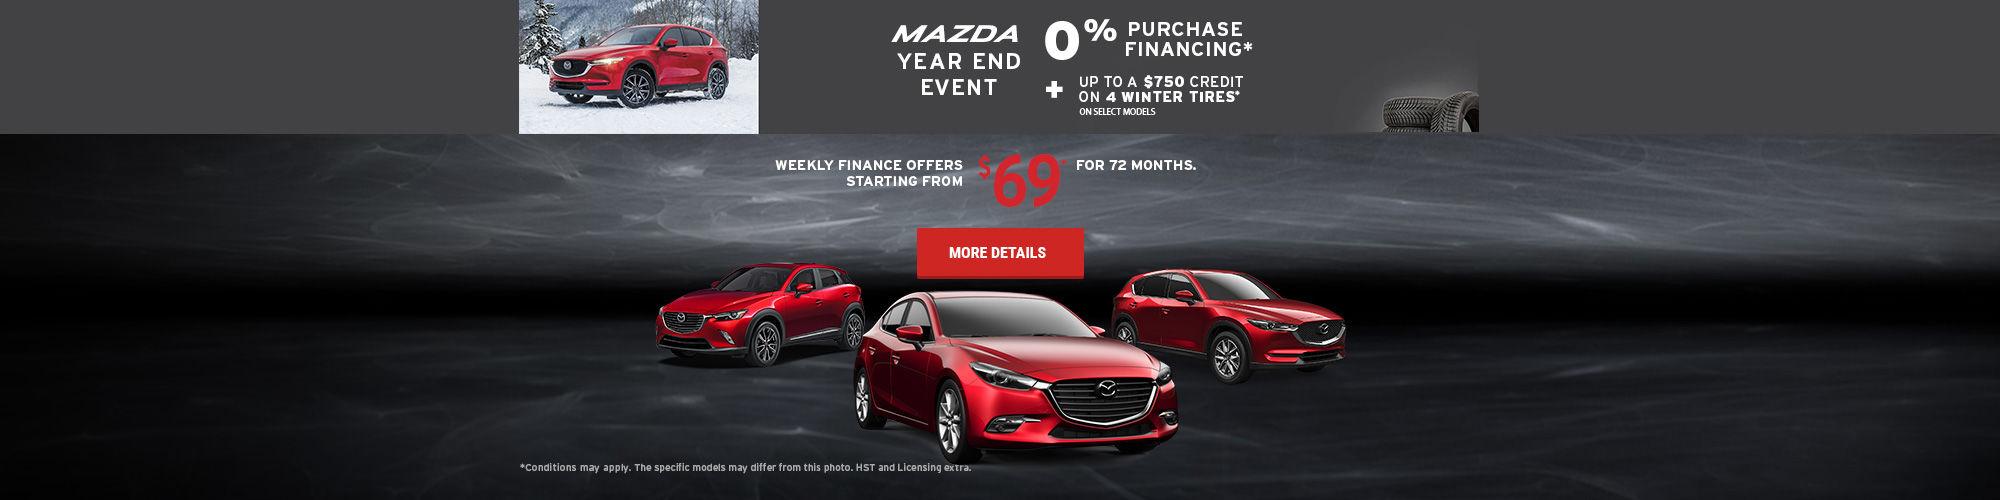 Mazda event